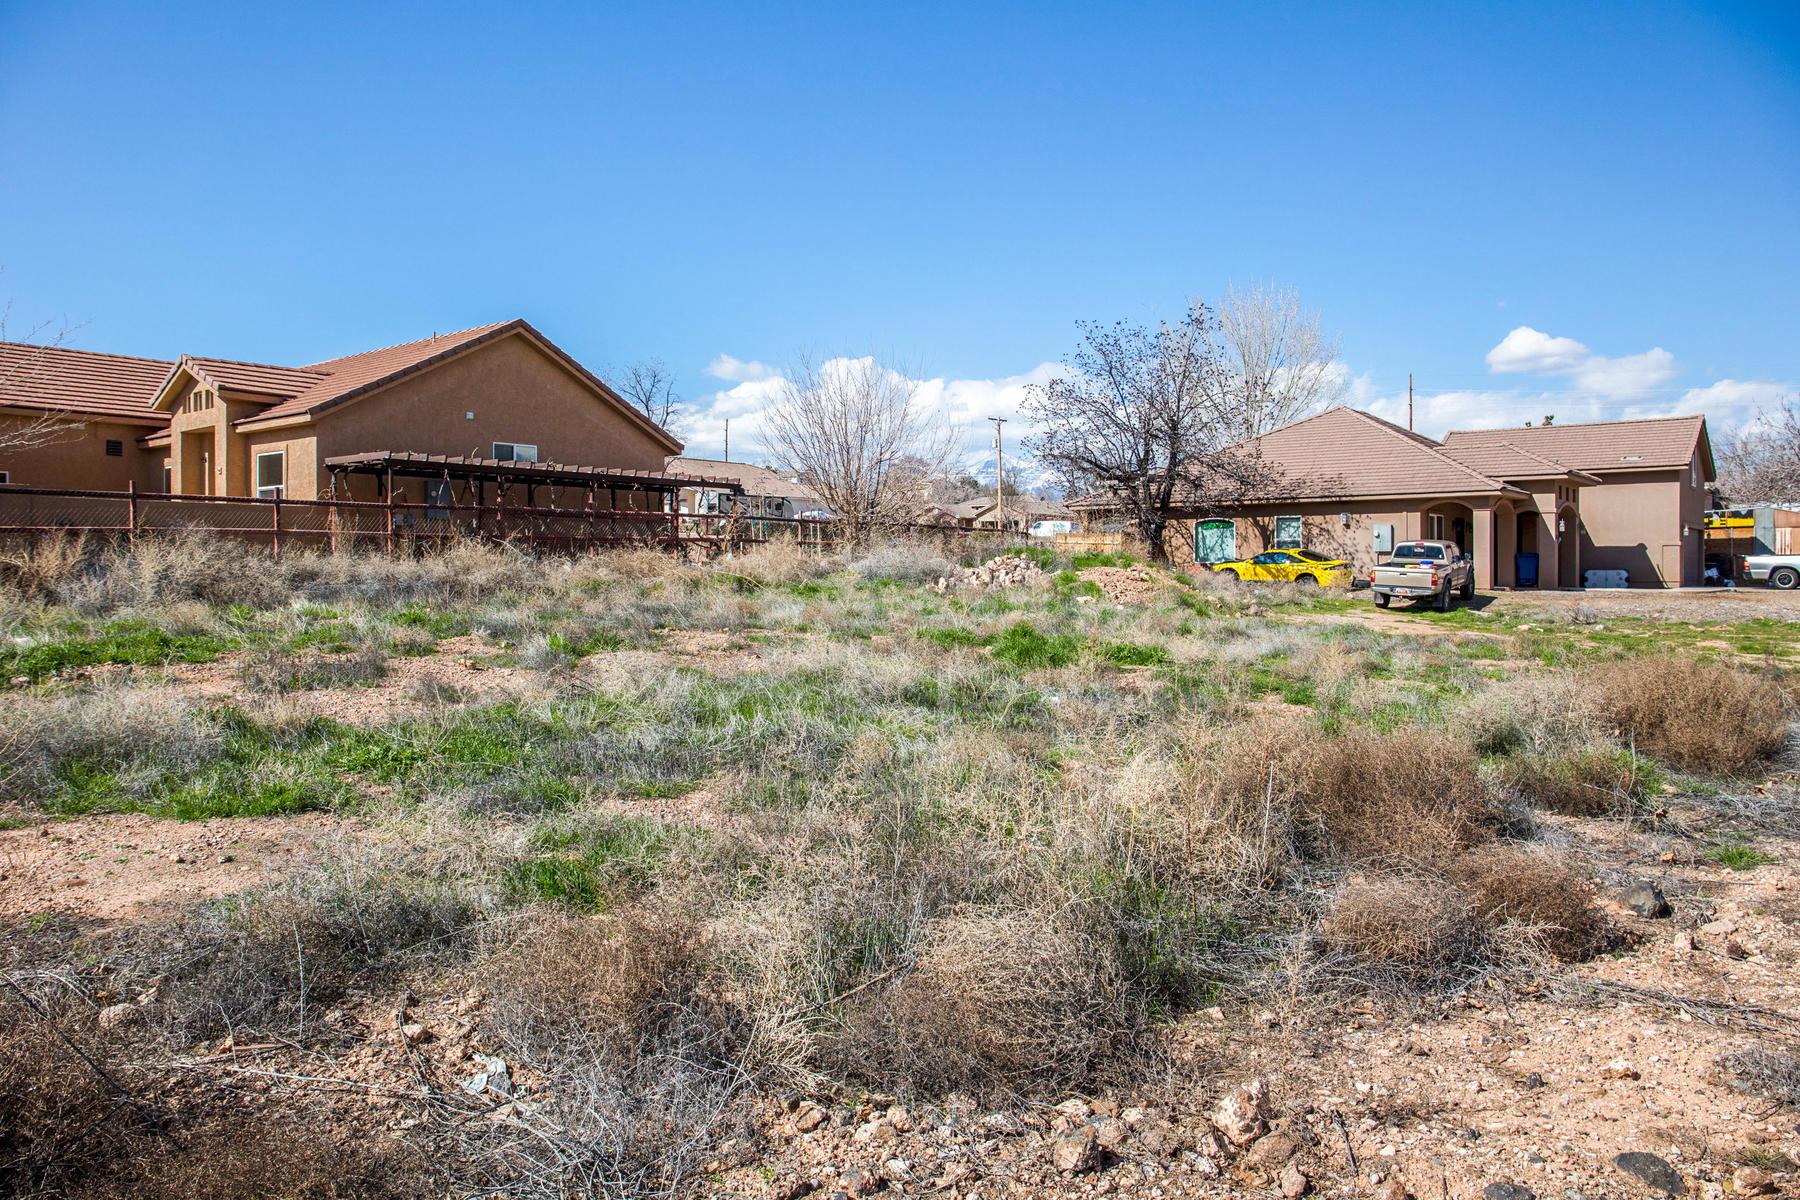 Land for Sale at Building Lot 480 N 120 E Lot 6 Hurricane, Utah, 84737 United States